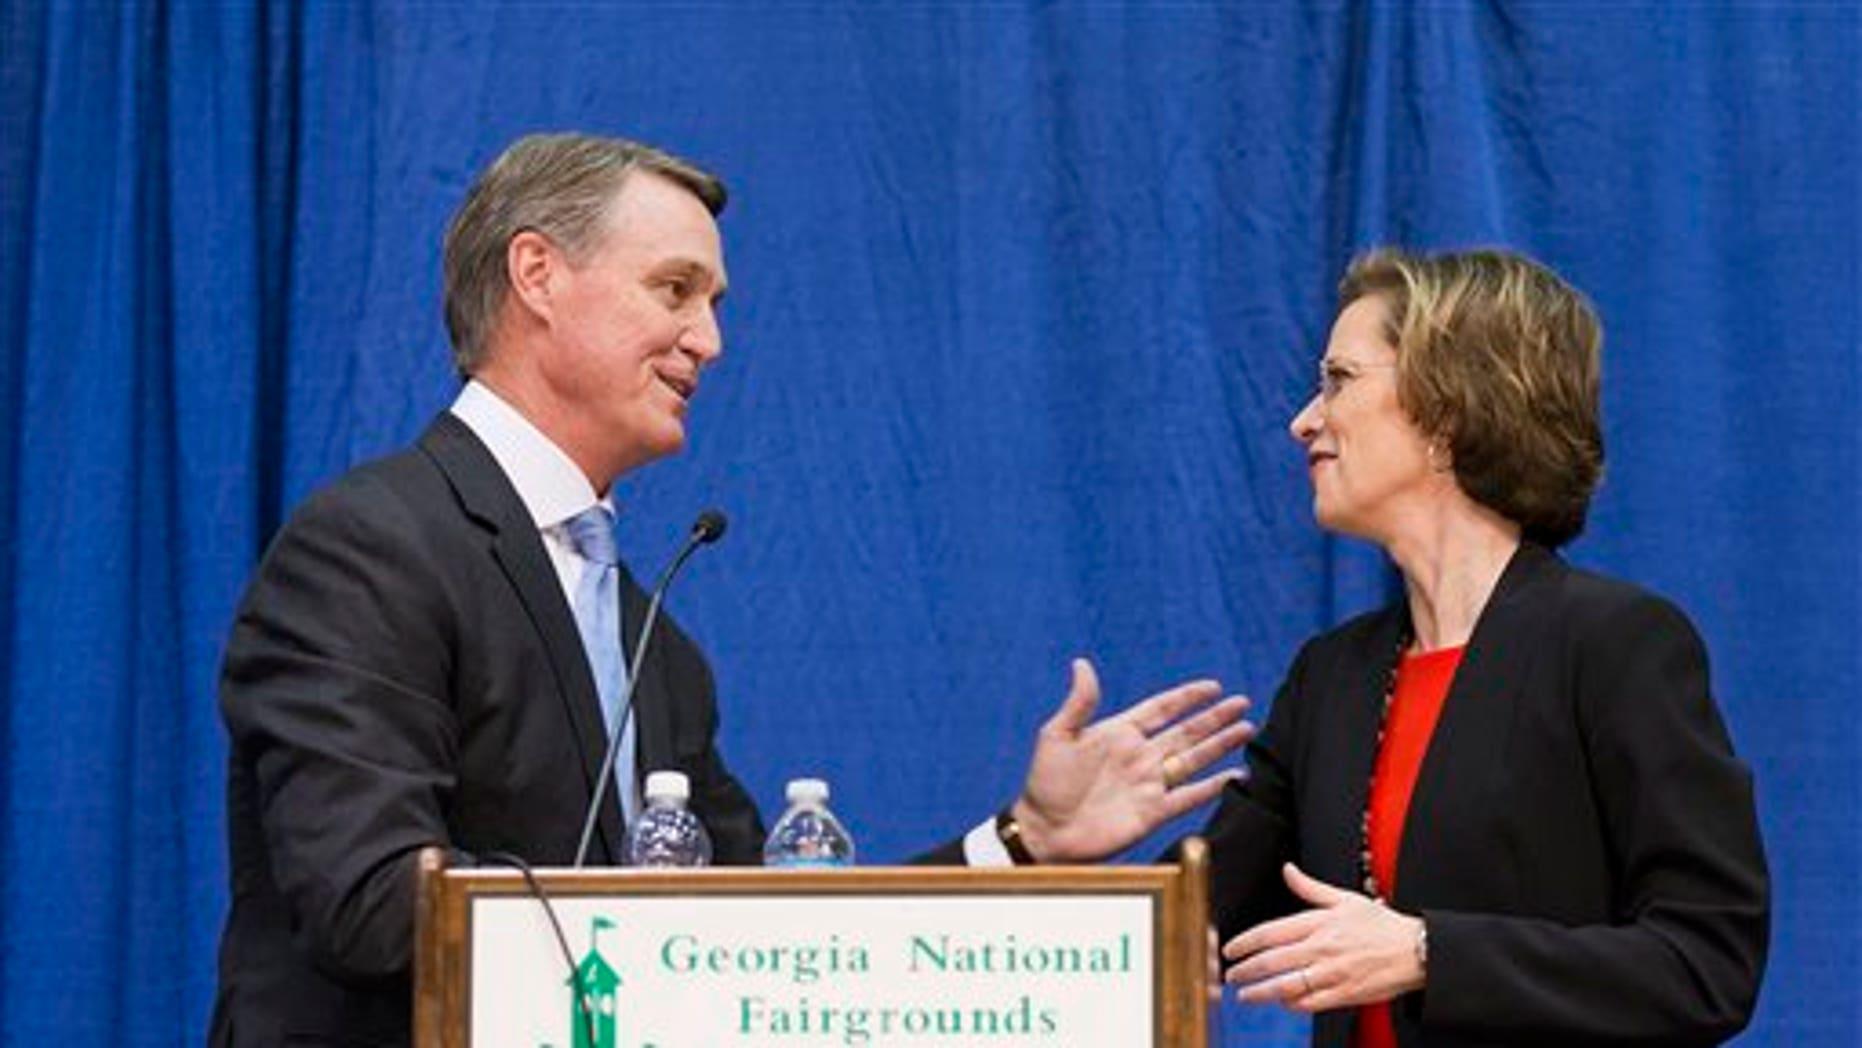 Georgia Democratic candidate for U.S. Senate Michelle Nunn, right, shakes hands with Republican candidate David Perdue following a debate, Tuesday, Oct. 7, 2014, in Perry, Ga. (AP Photo/David Goldman)